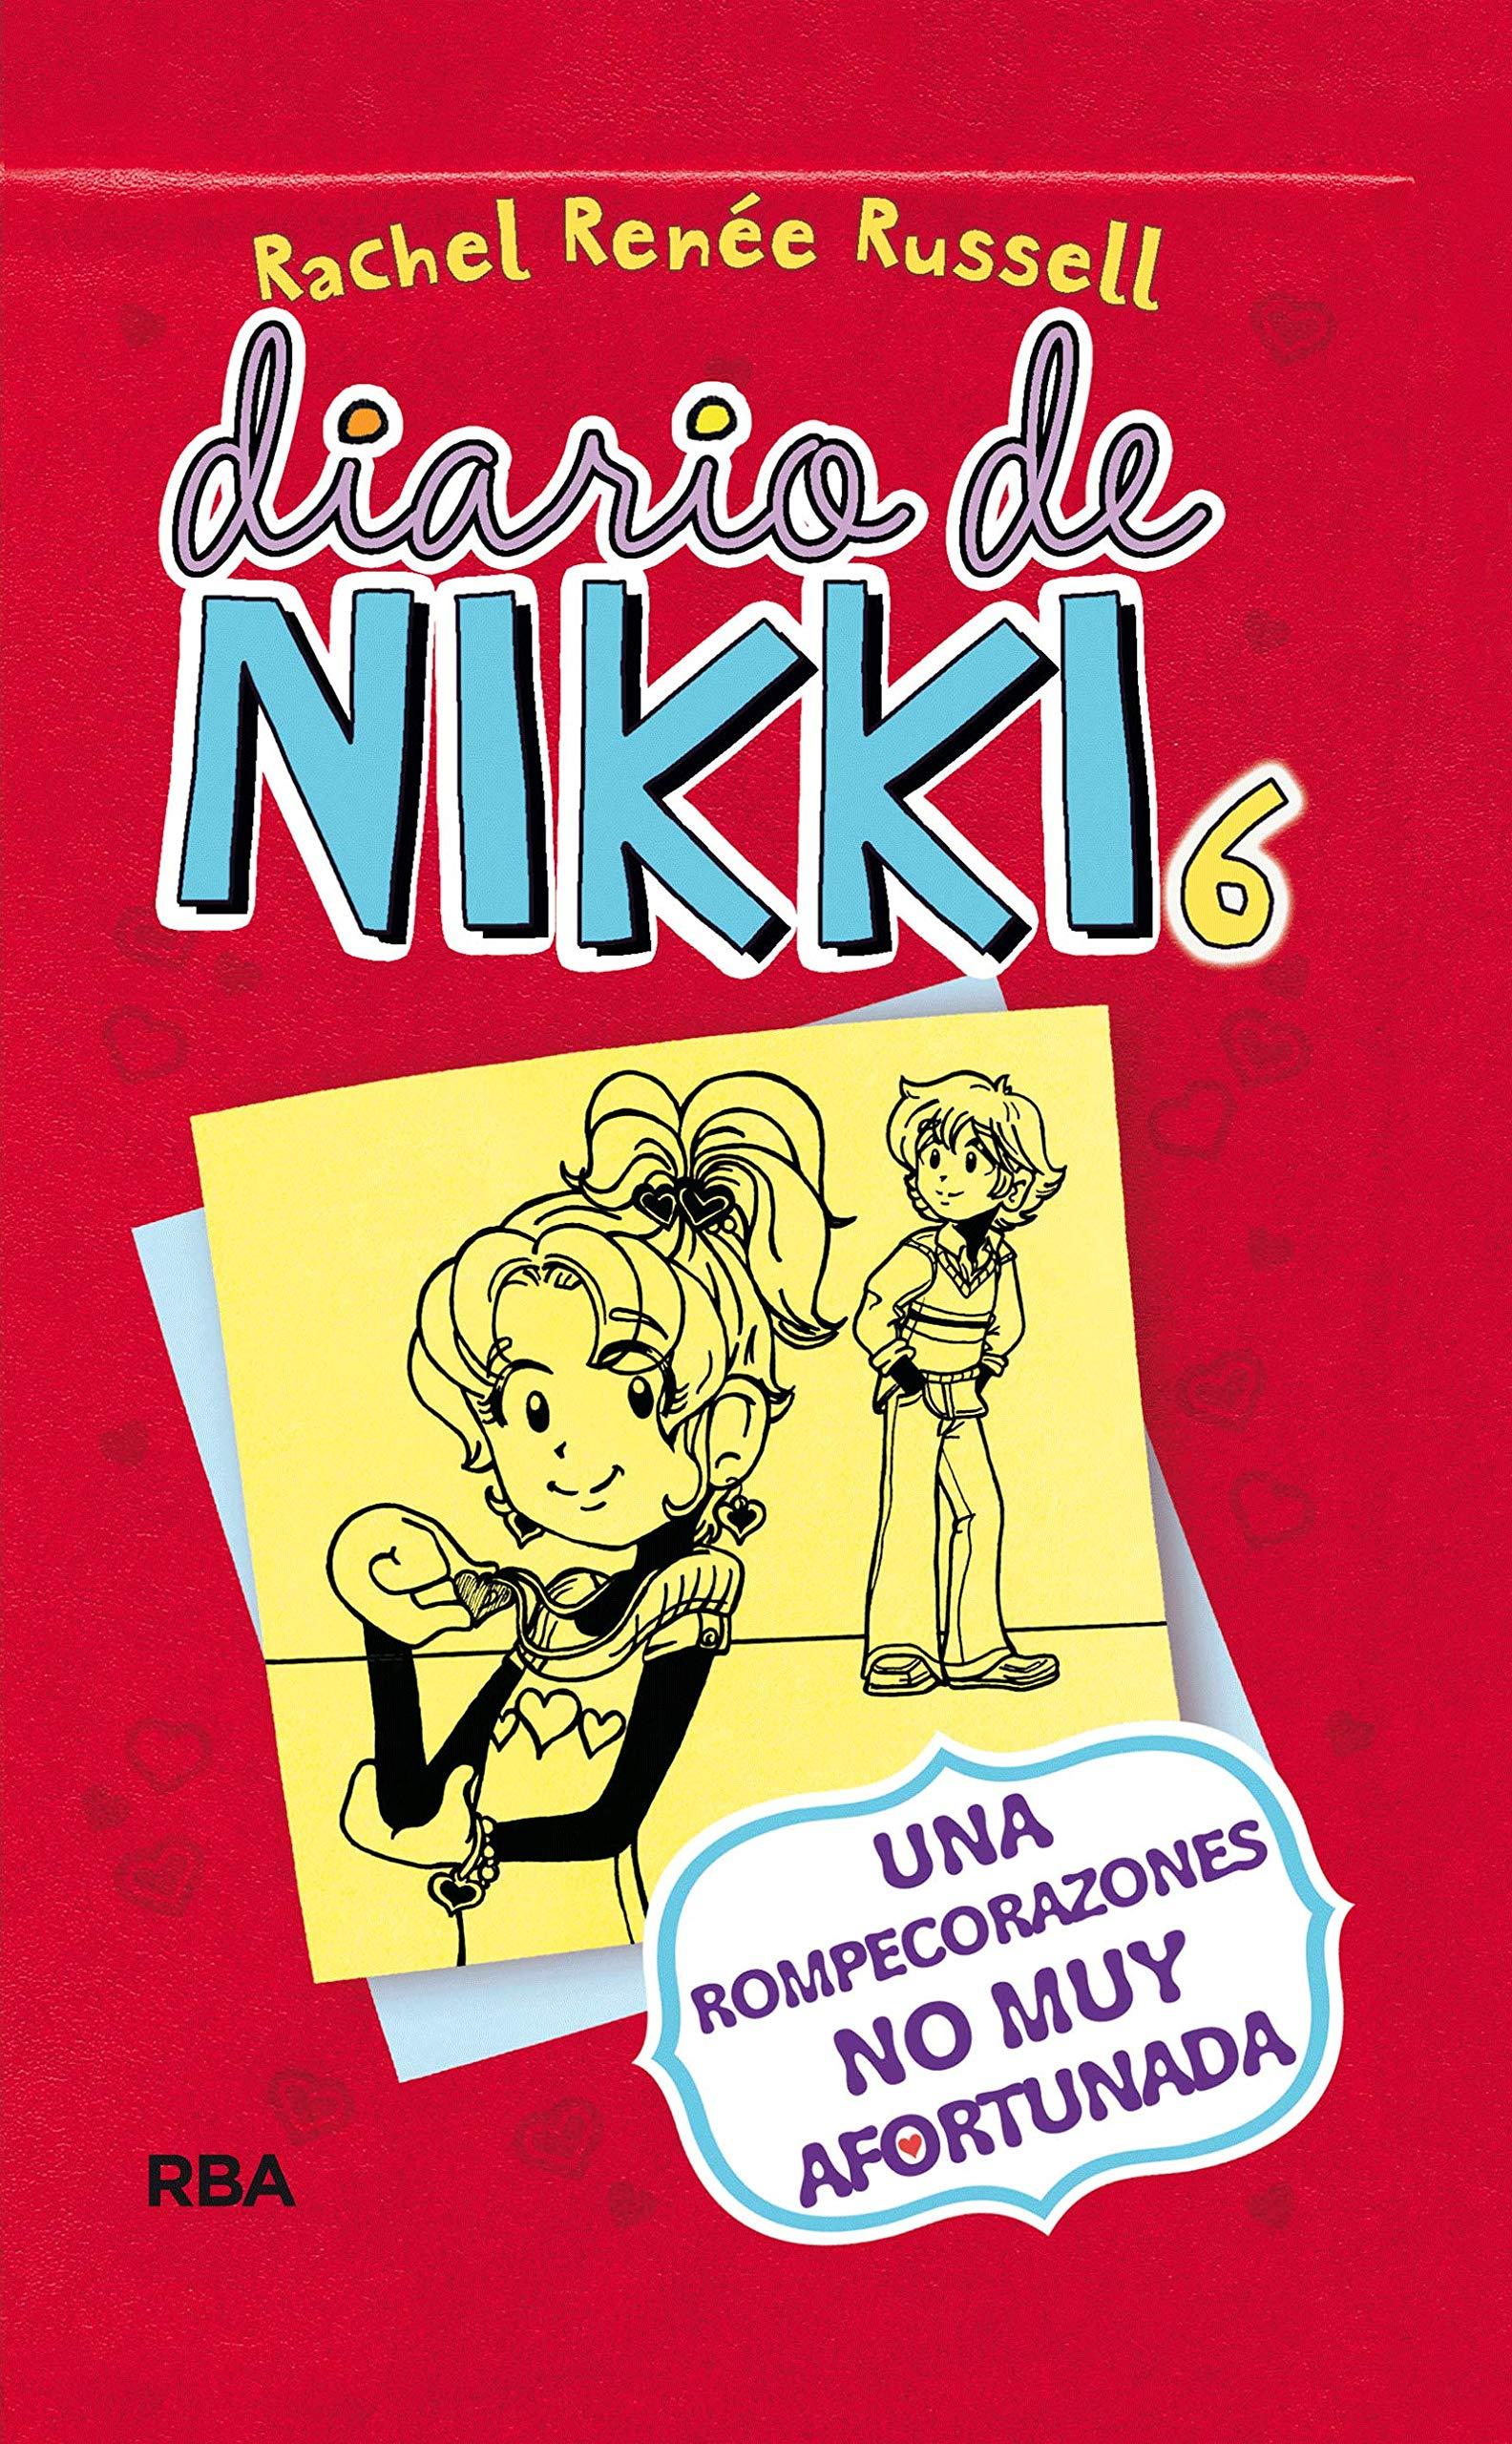 Diario De Nikki 6 Una Rompecorazones No Muy Afortunada Una Rompecorazones No Muy Afortunada Spanish Edition Russell Rachel Rénee Llasat Botija Isabel 9788427204447 Books